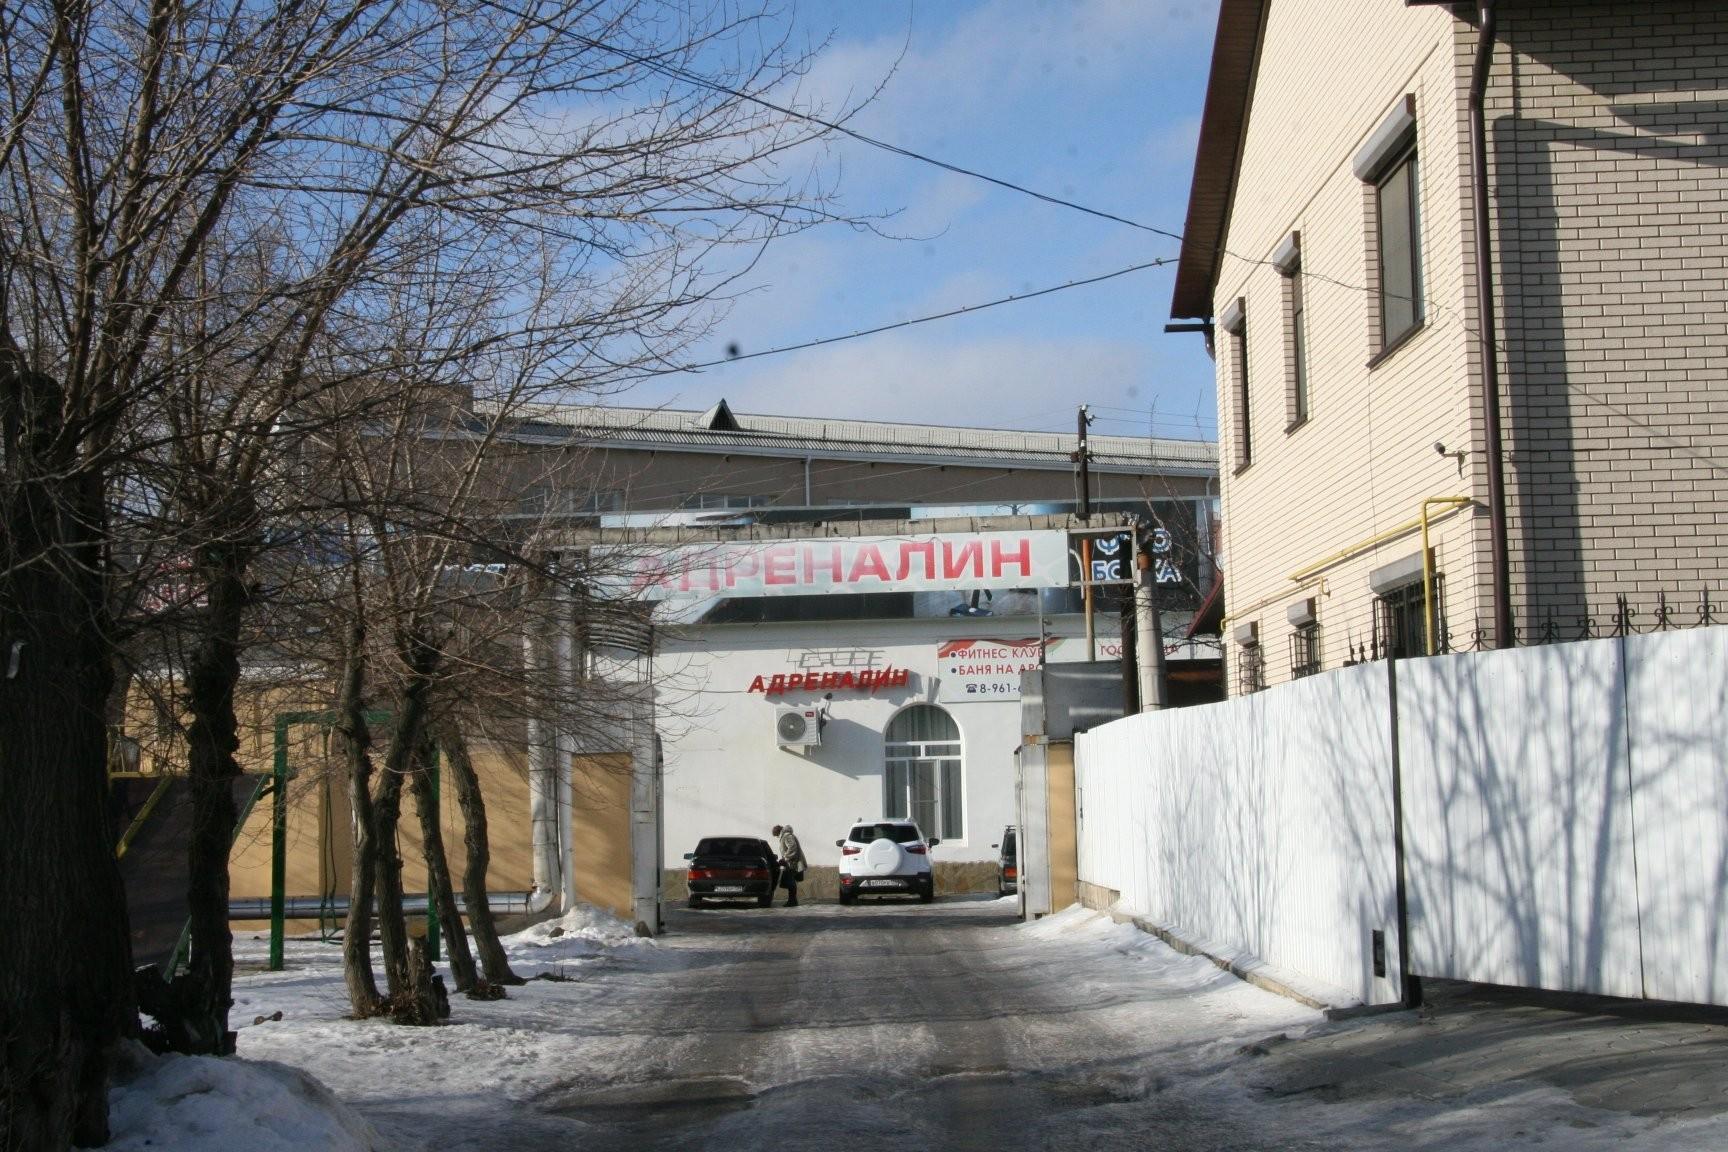 Адреналин, центр отдыха - №1